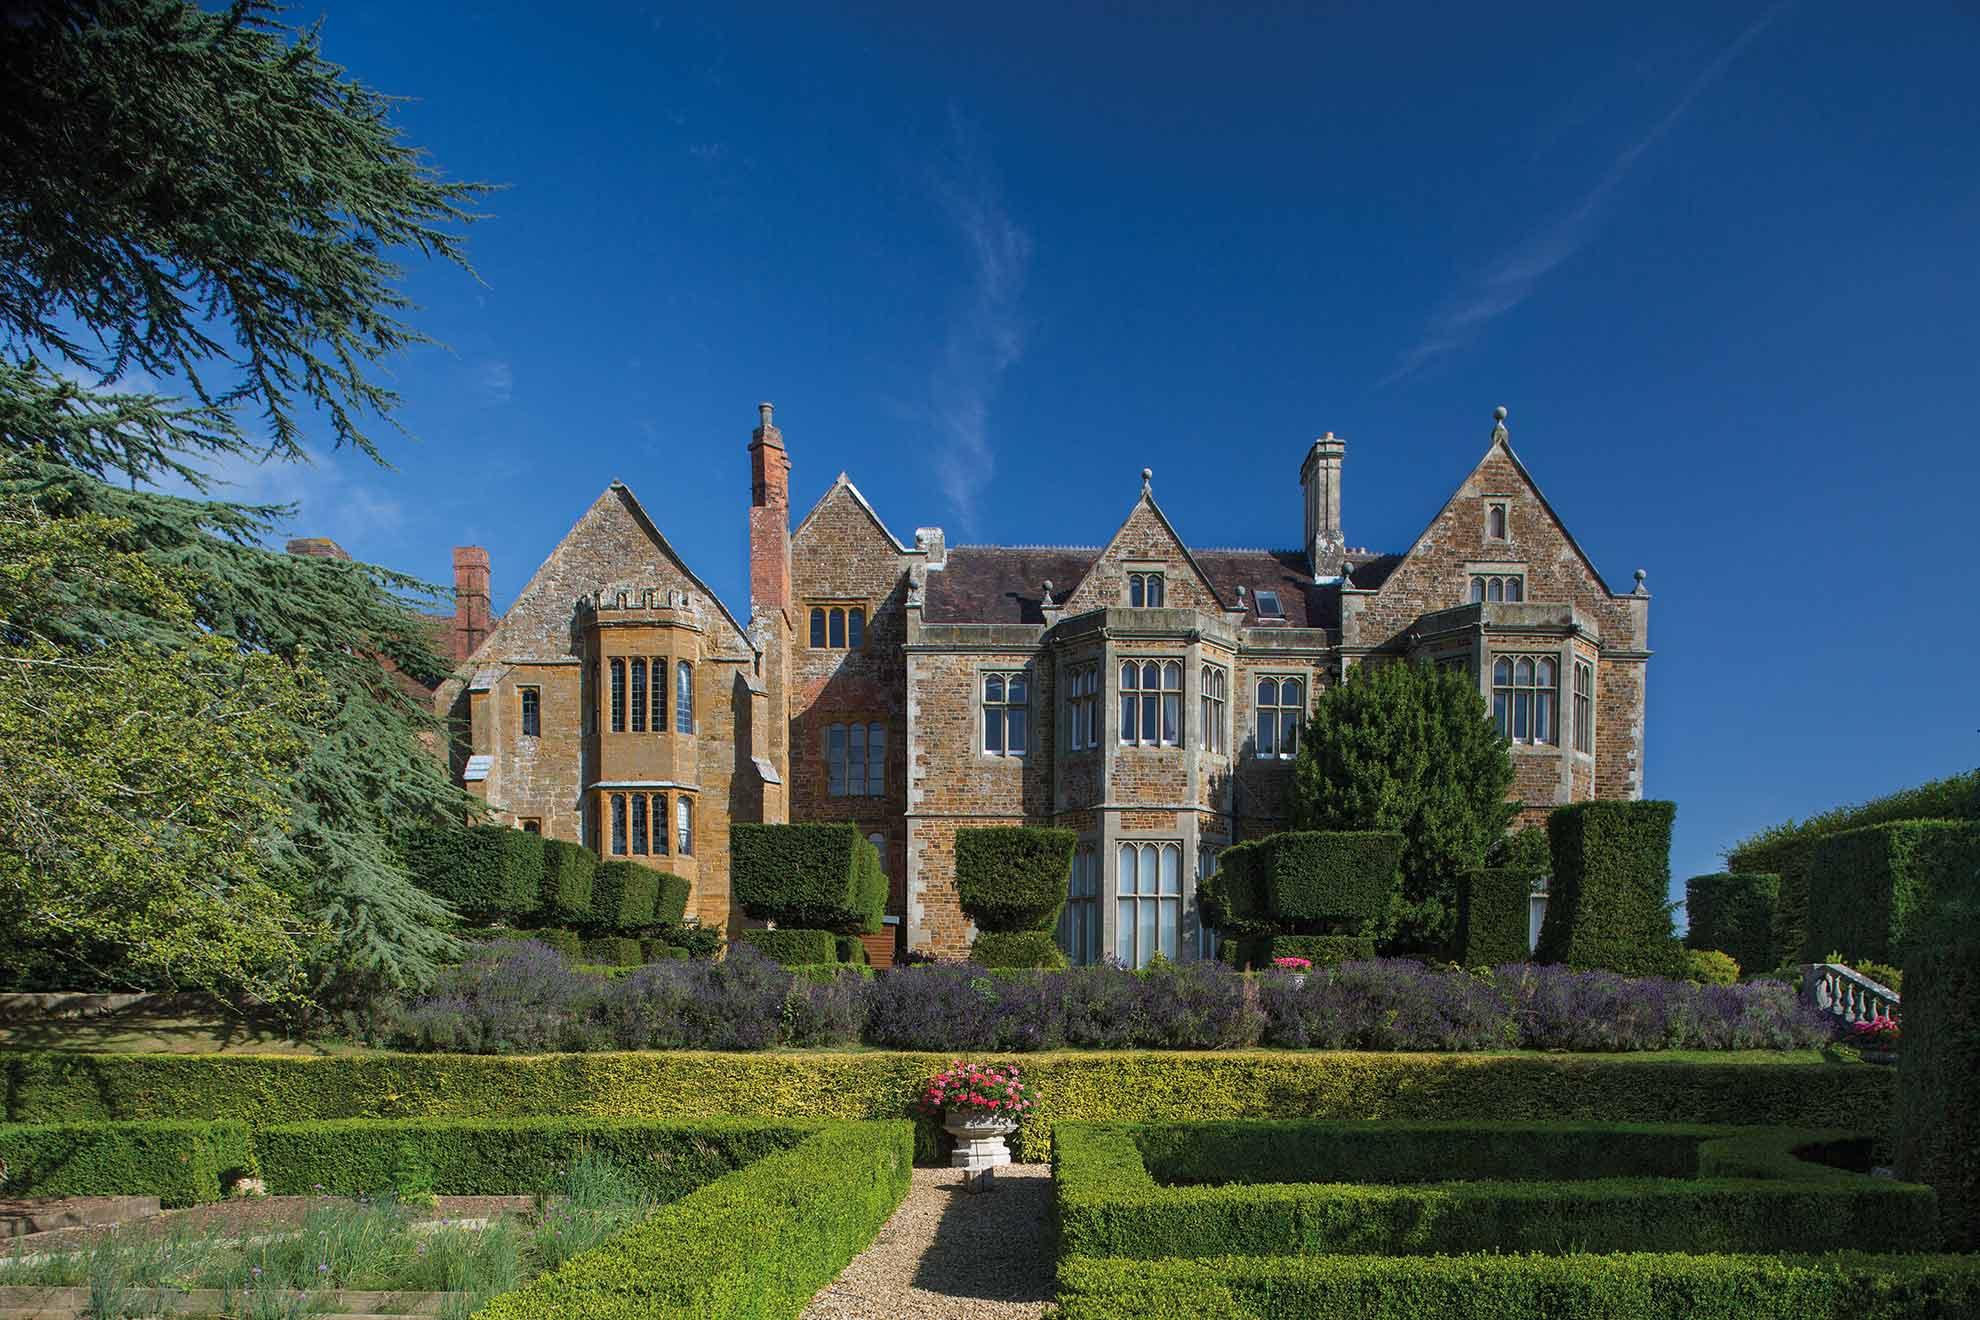 Fawsley-Hall-Hotel,-Northamptonshire